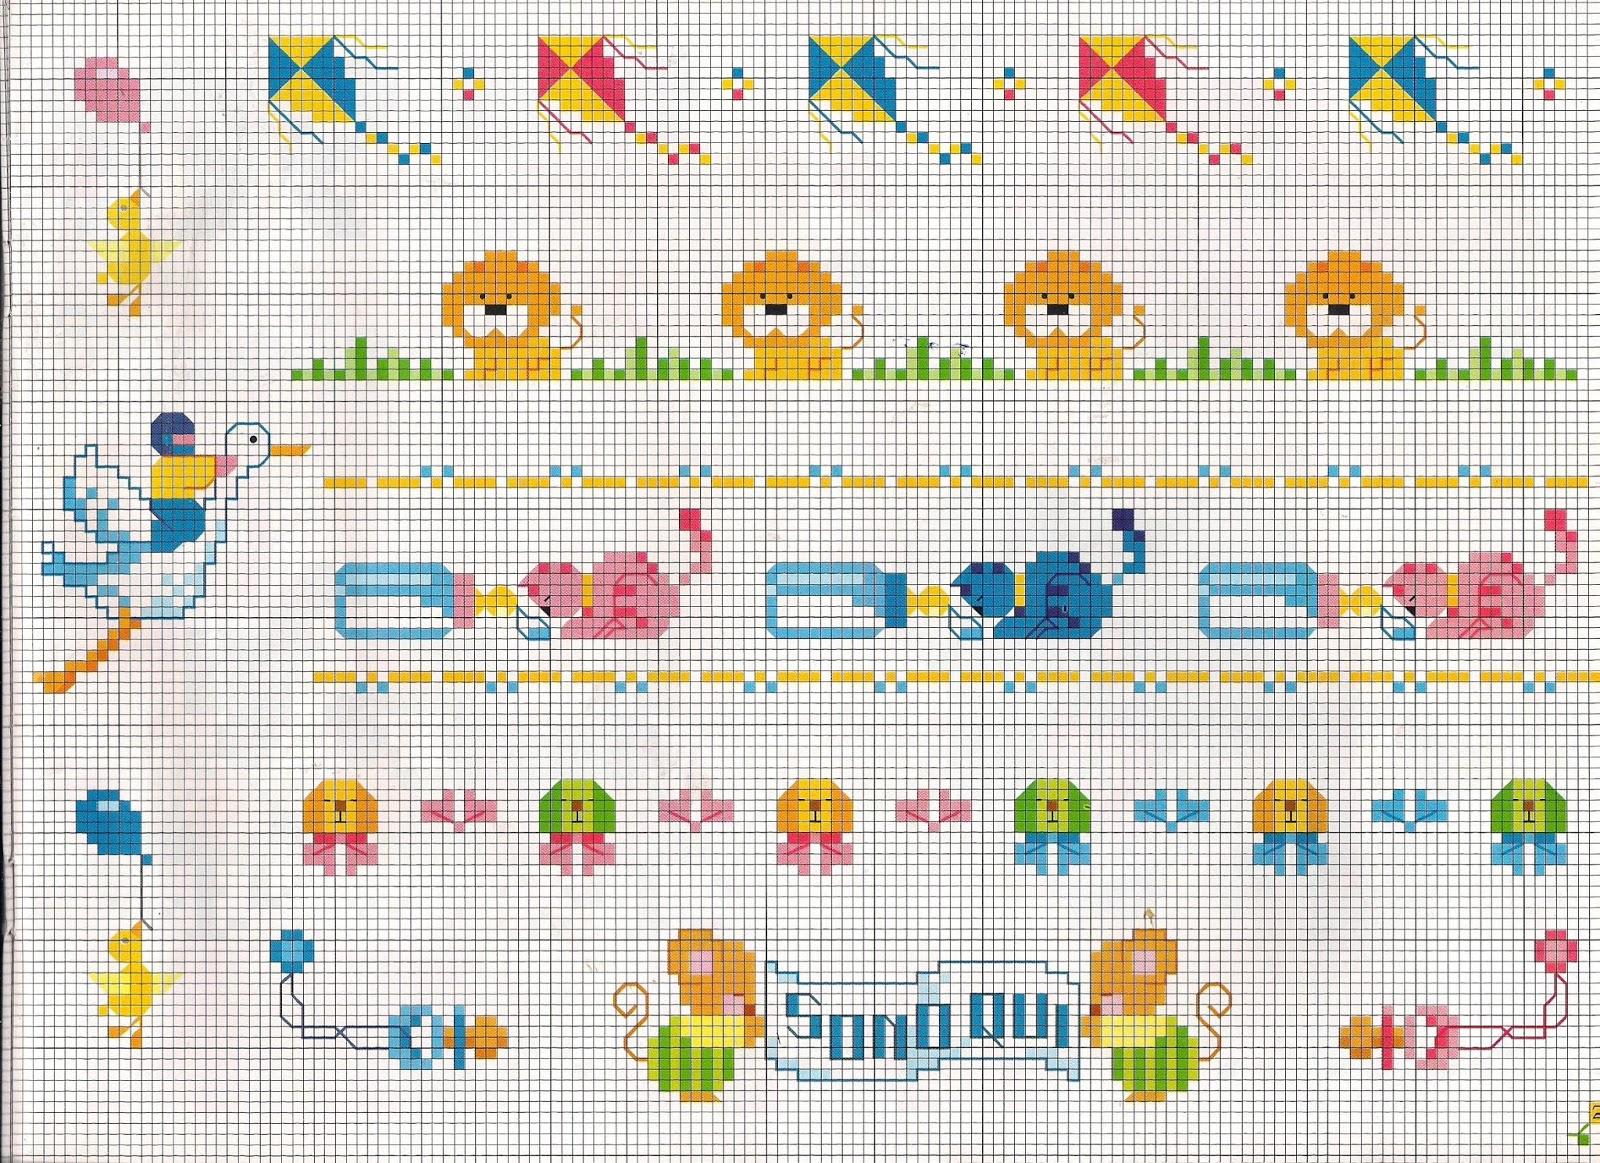 Farfalle a punto croce per bavaglini ir94 pineglen for Farfalle a punto croce per bambini